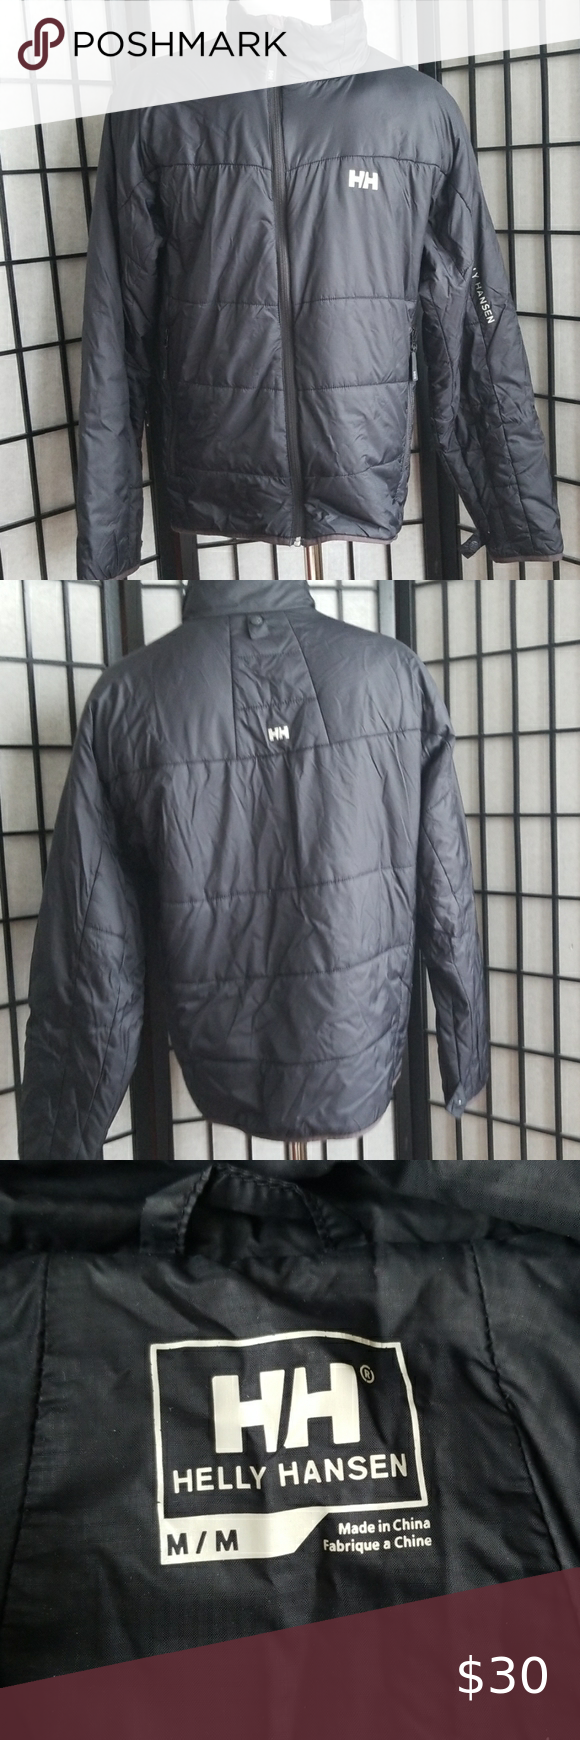 Helly Hansen Puffer Jacket Puffer Jackets Jackets Helly Hansen Jacket [ 1740 x 580 Pixel ]